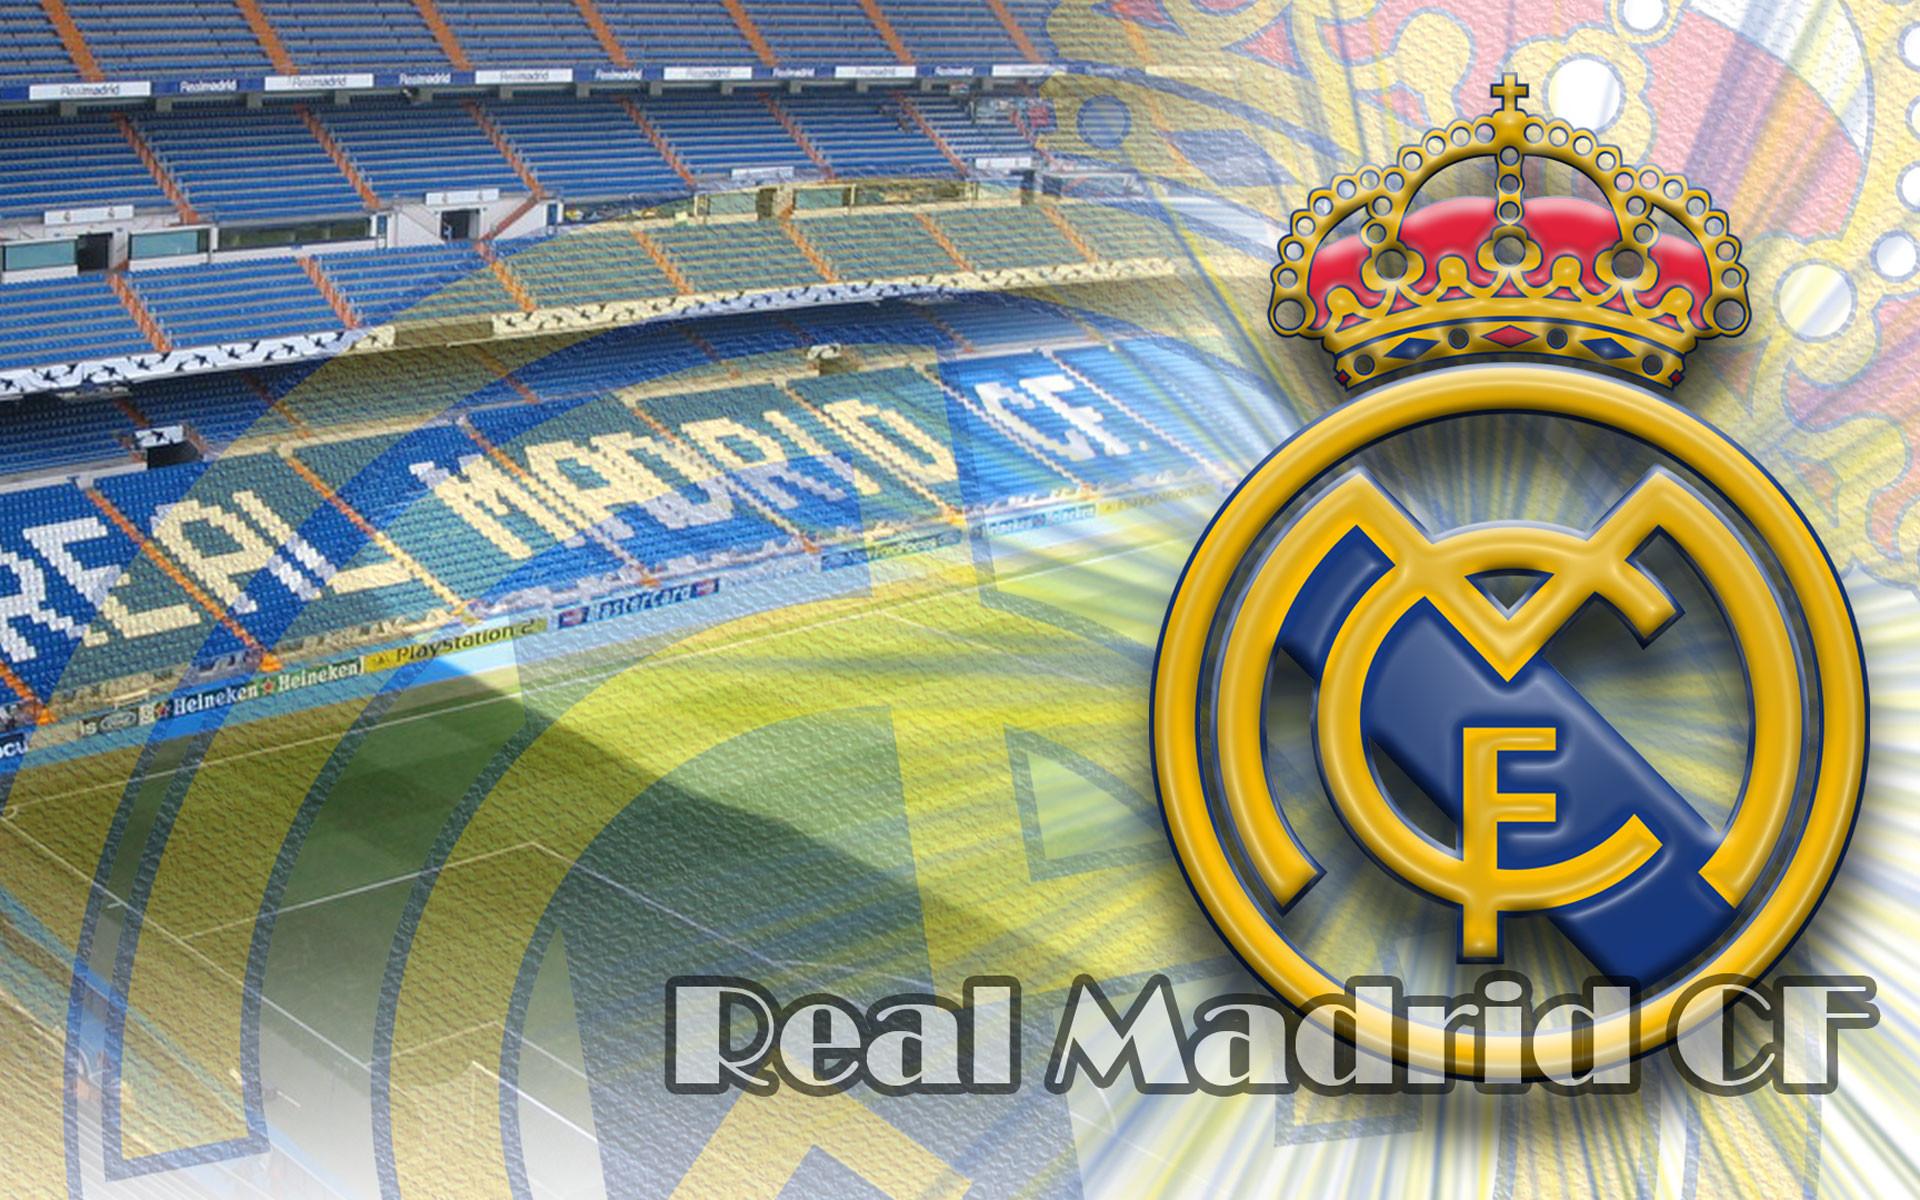 Res: 1920x1200, Real-Madrid-C.F.-IPad-Free-HD-Background-Apple-